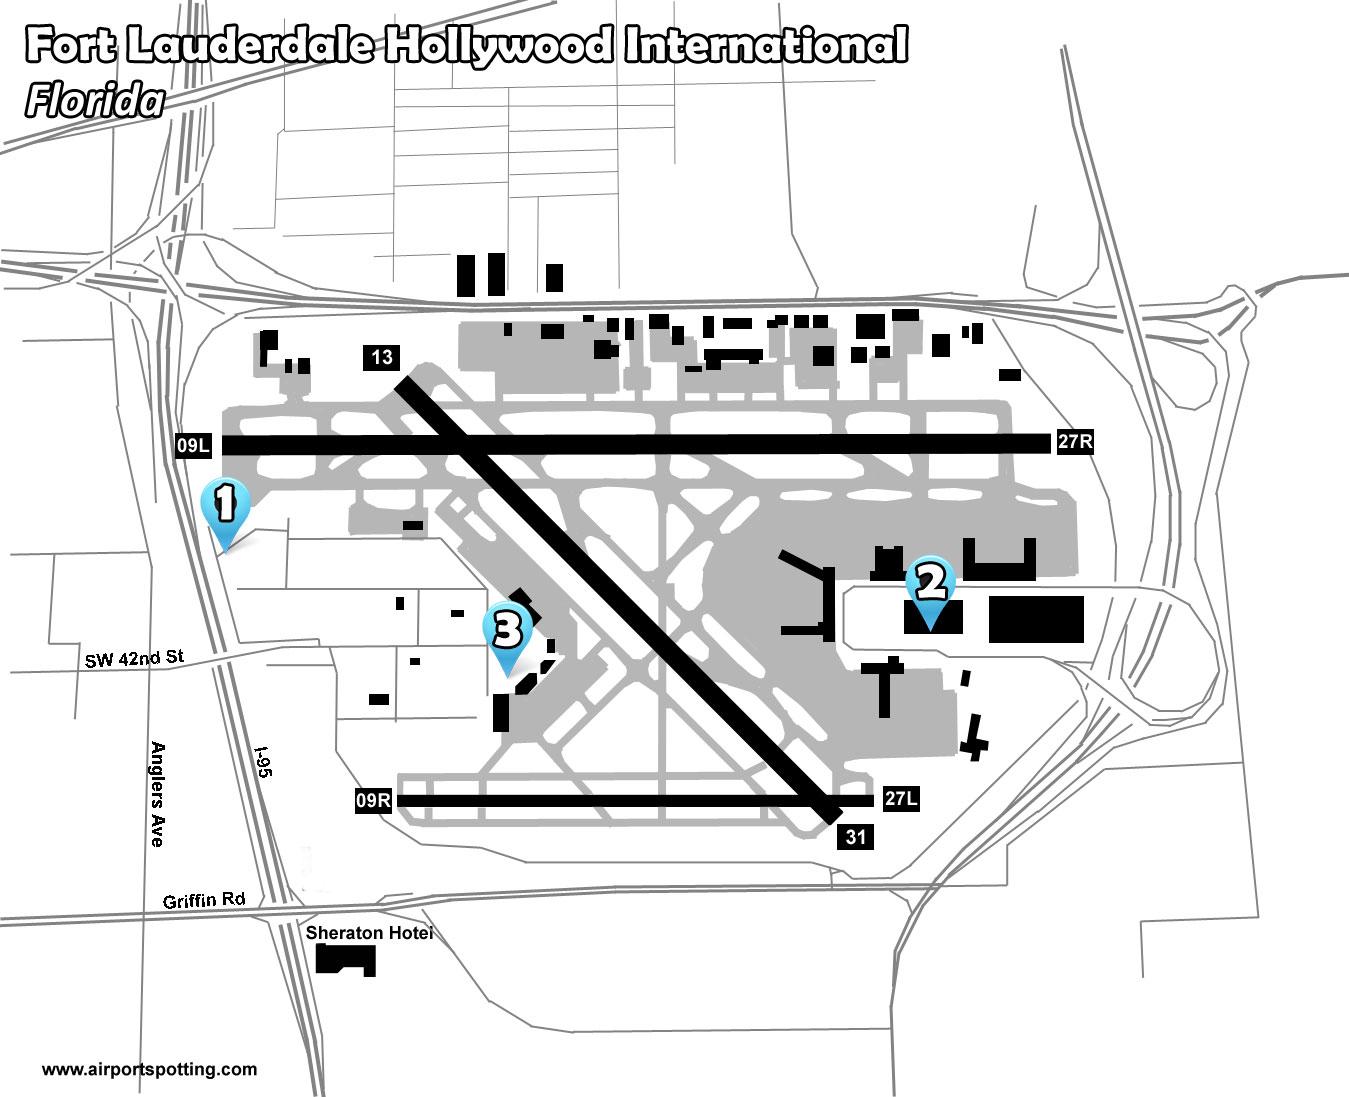 Fll Fort Lauderdalehollywood International Airport